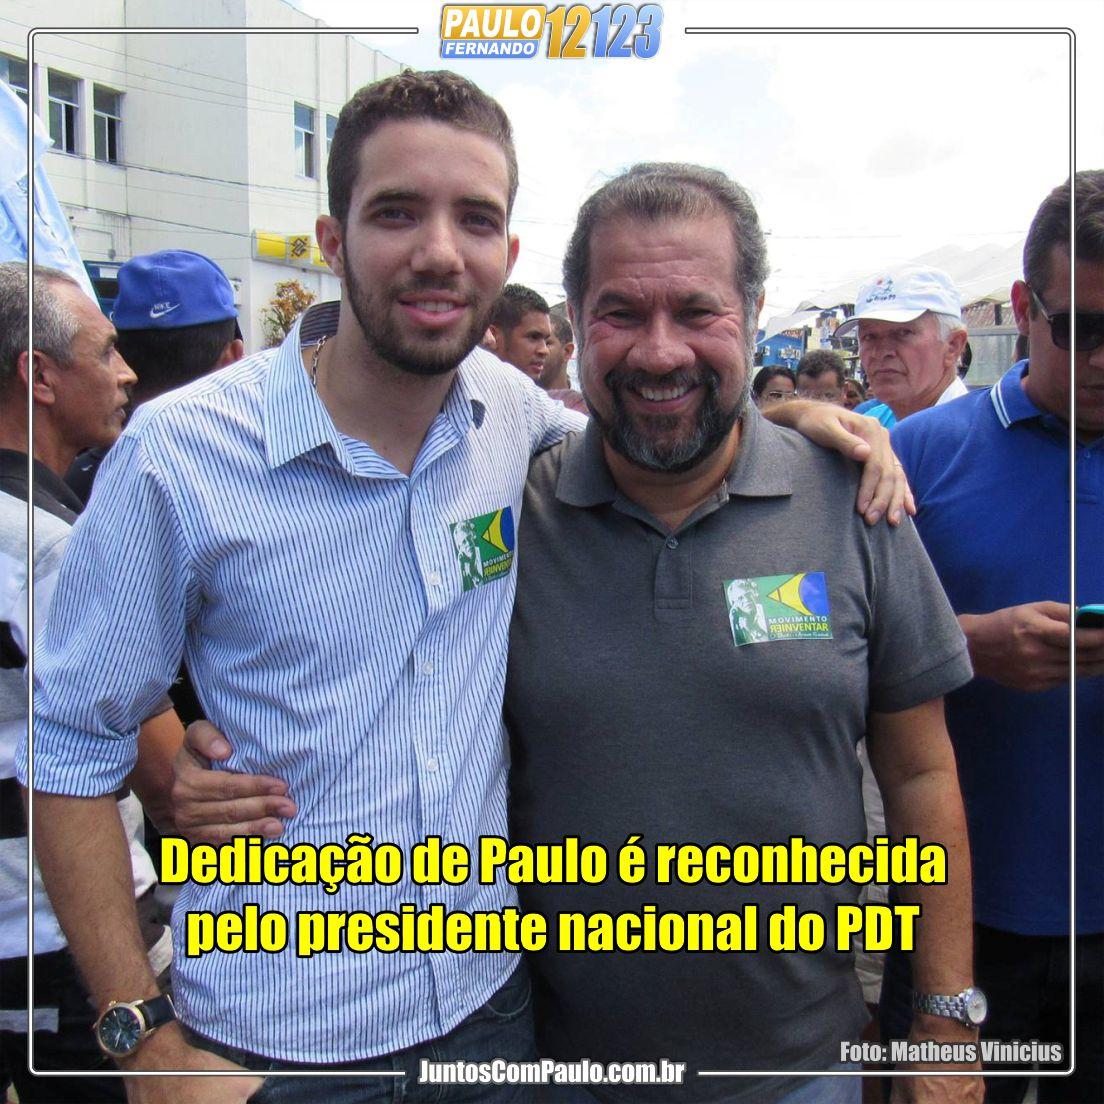 Carlos Lupi, apoia a candidatura de Paulo Fernando para o cargo de vereador do Paulista